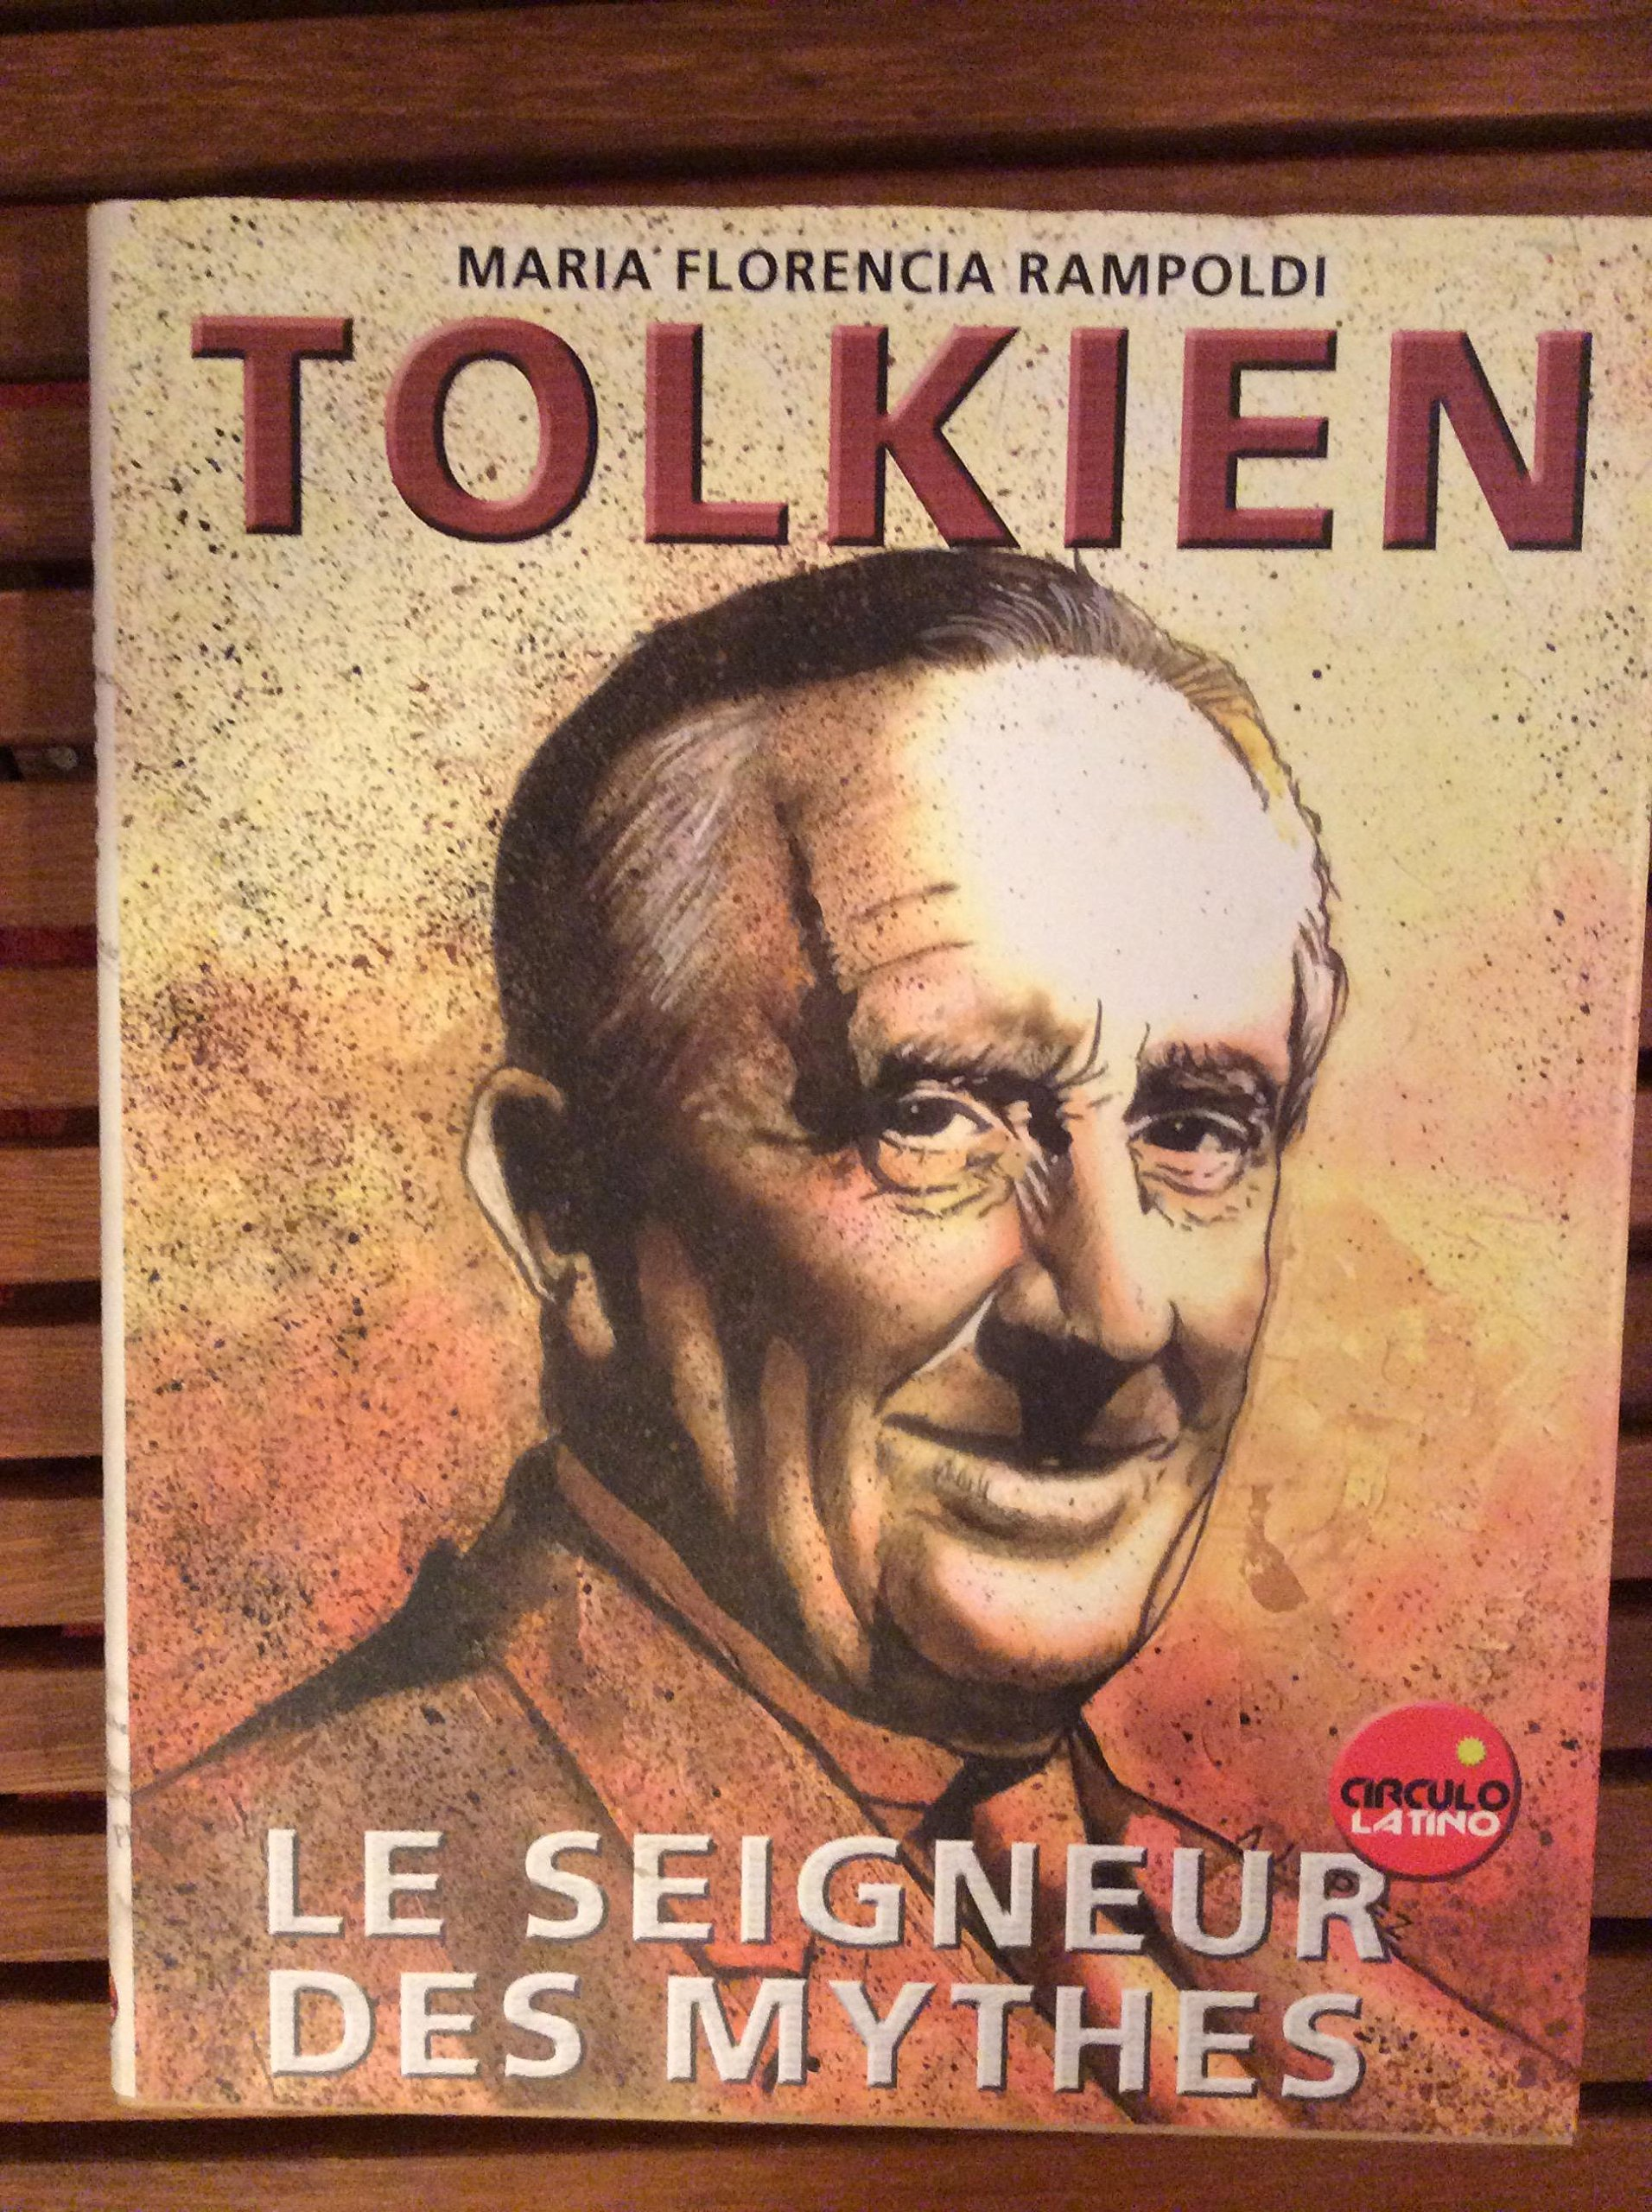 Tolkien, le seigneur des mythes (Univers alternatifs): Amazon.es: Maria-Florencia Rampoldi: Libros en idiomas extranjeros